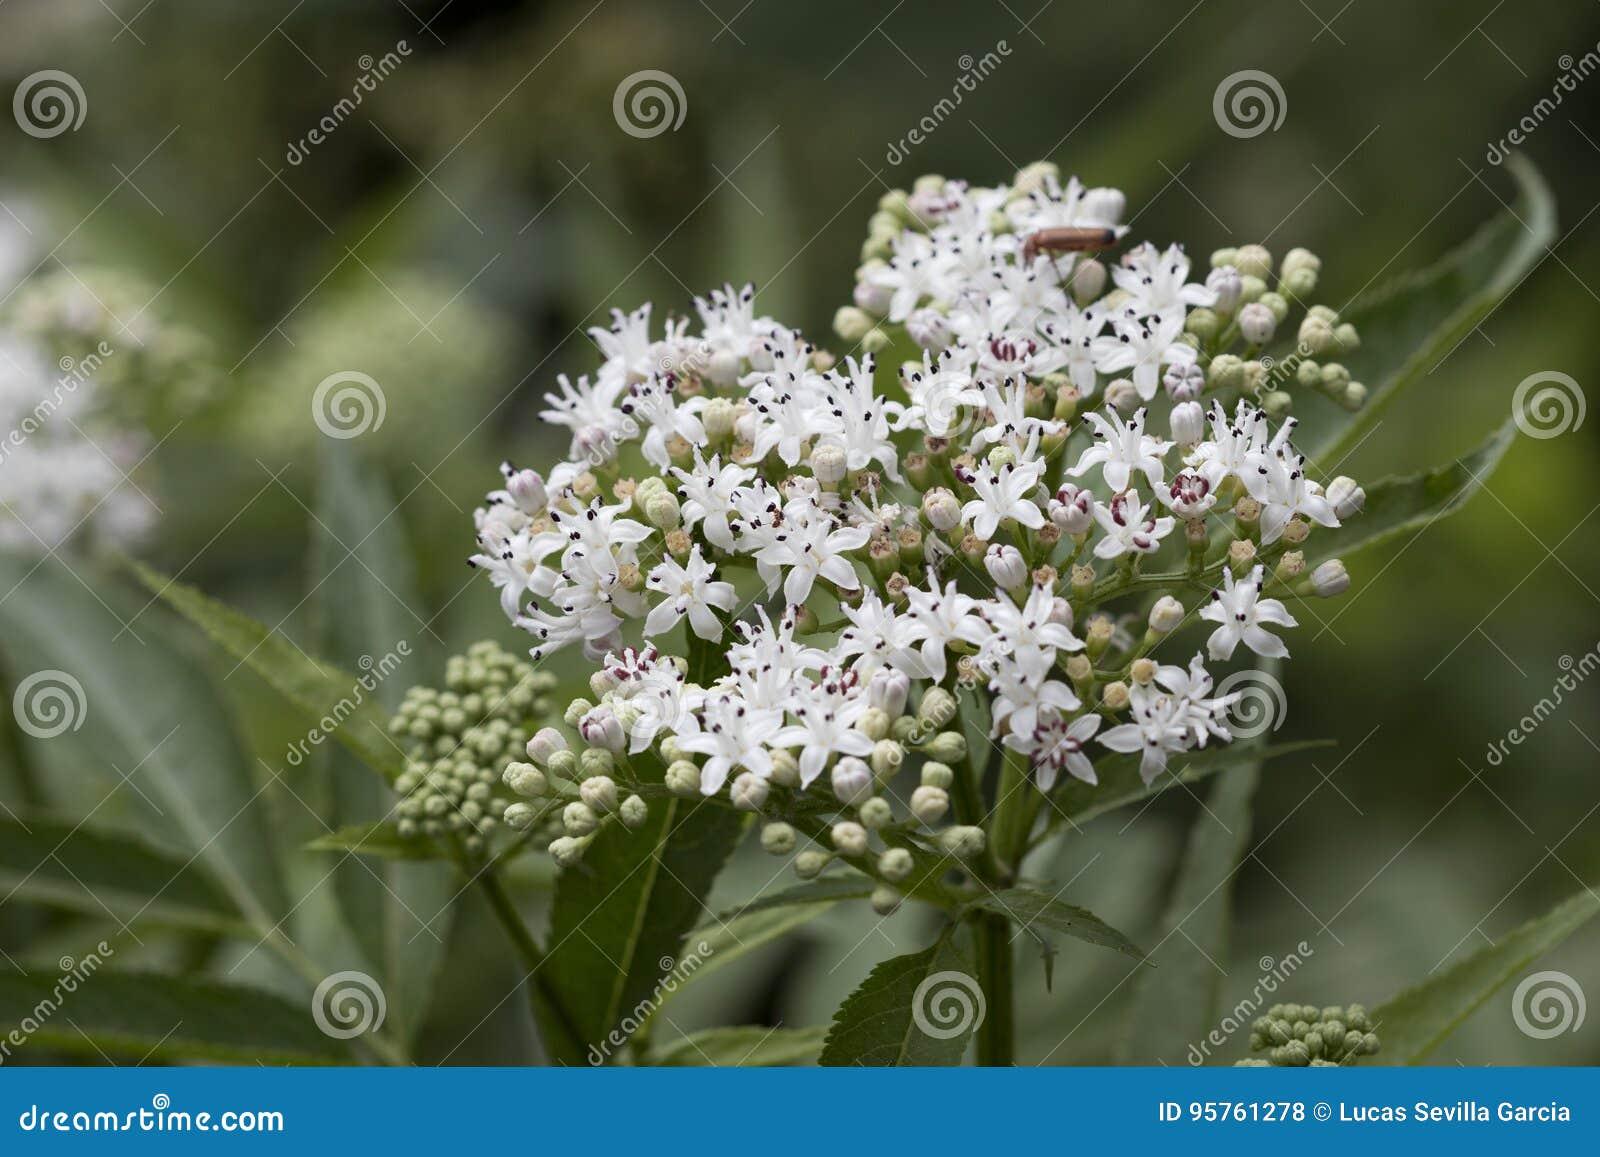 Blossom Of White Flowers From Viburnum Shrub Stock Photo Image Of